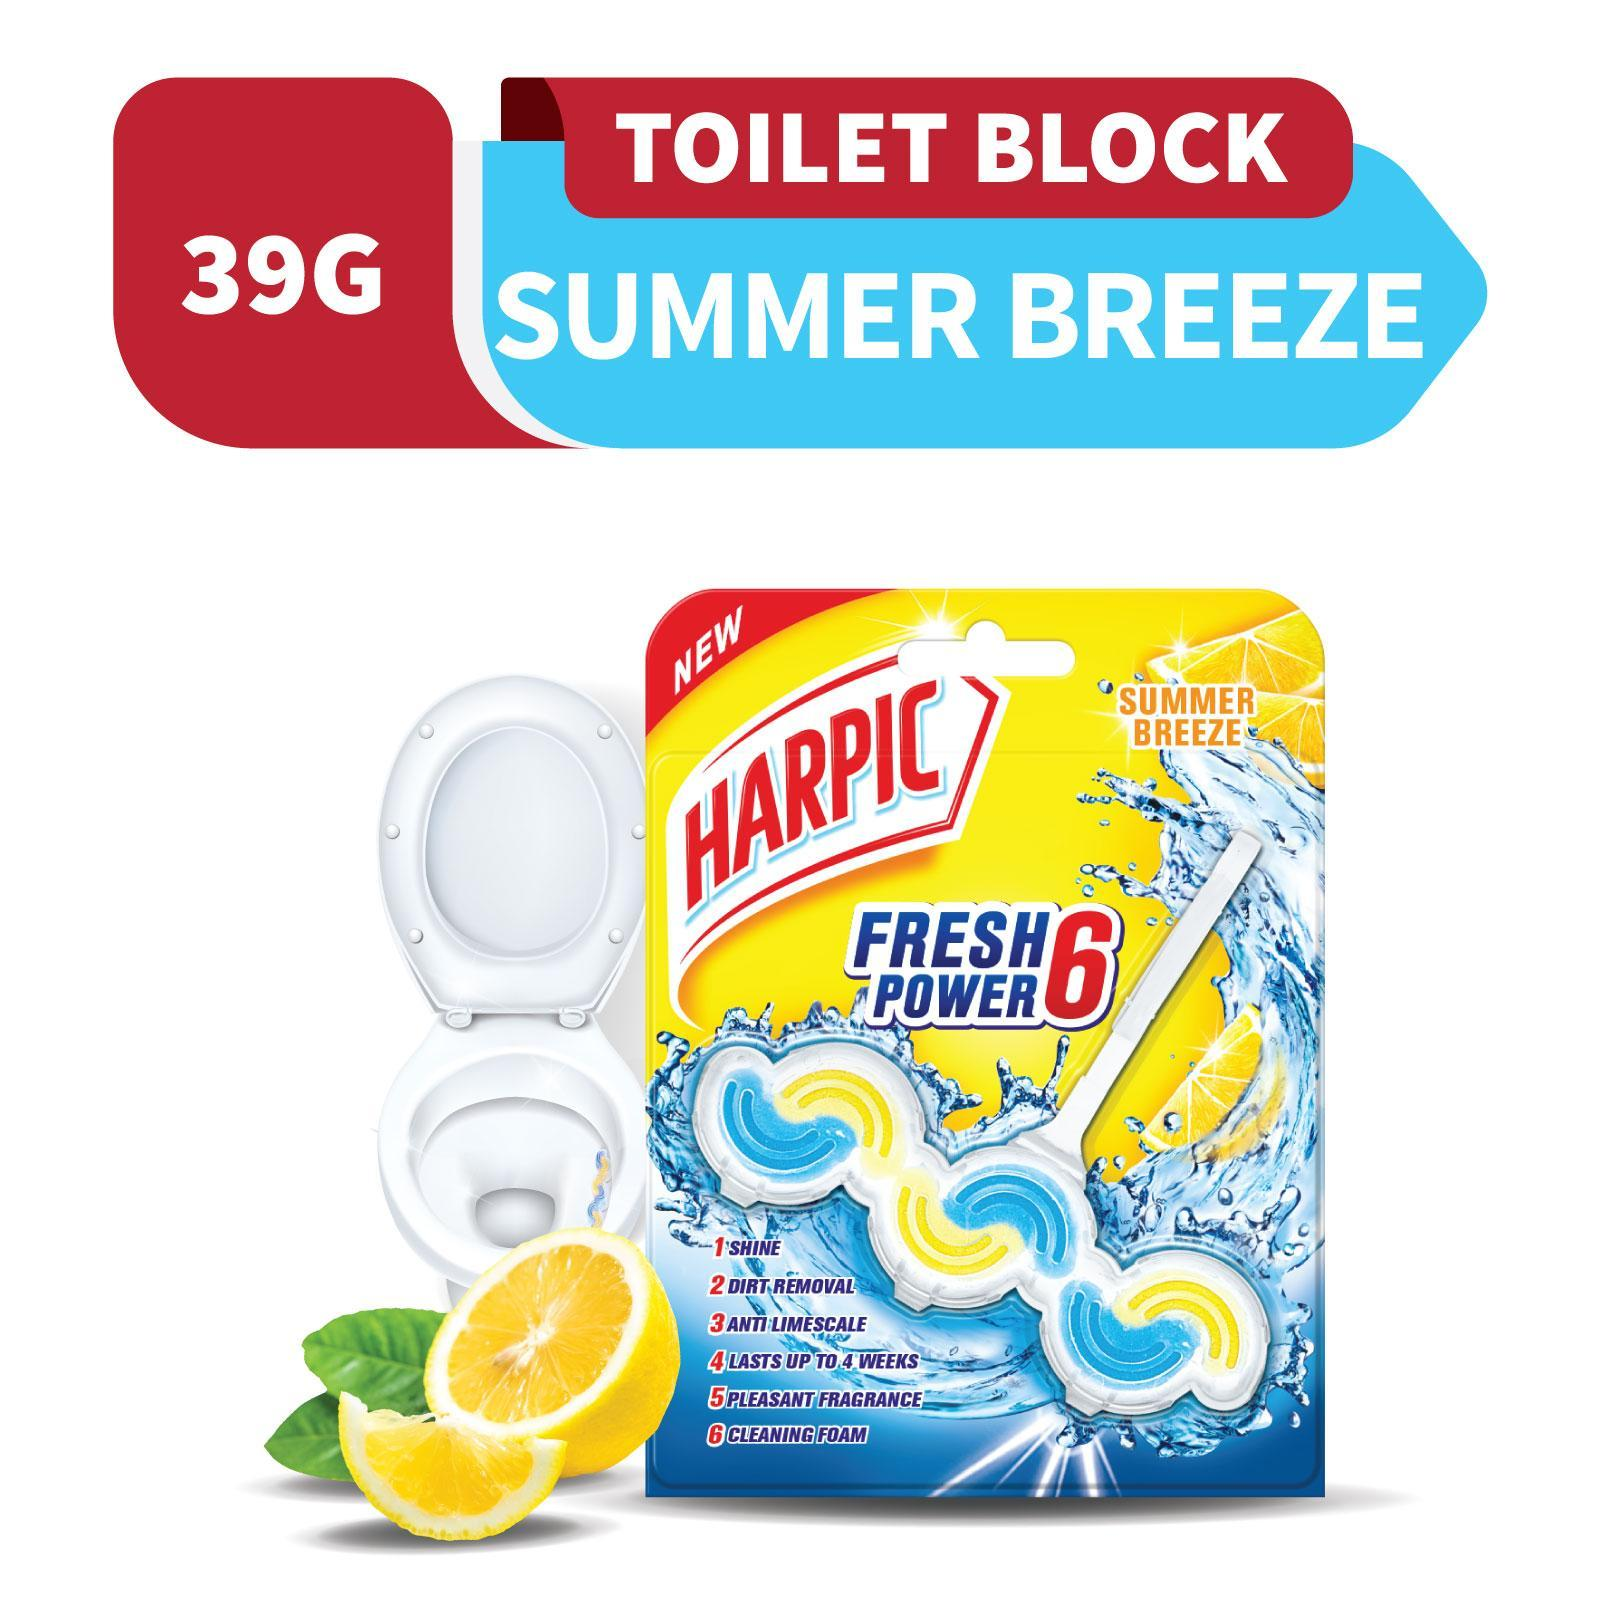 Harpic Fresh Power 6 Block Summer Breeze